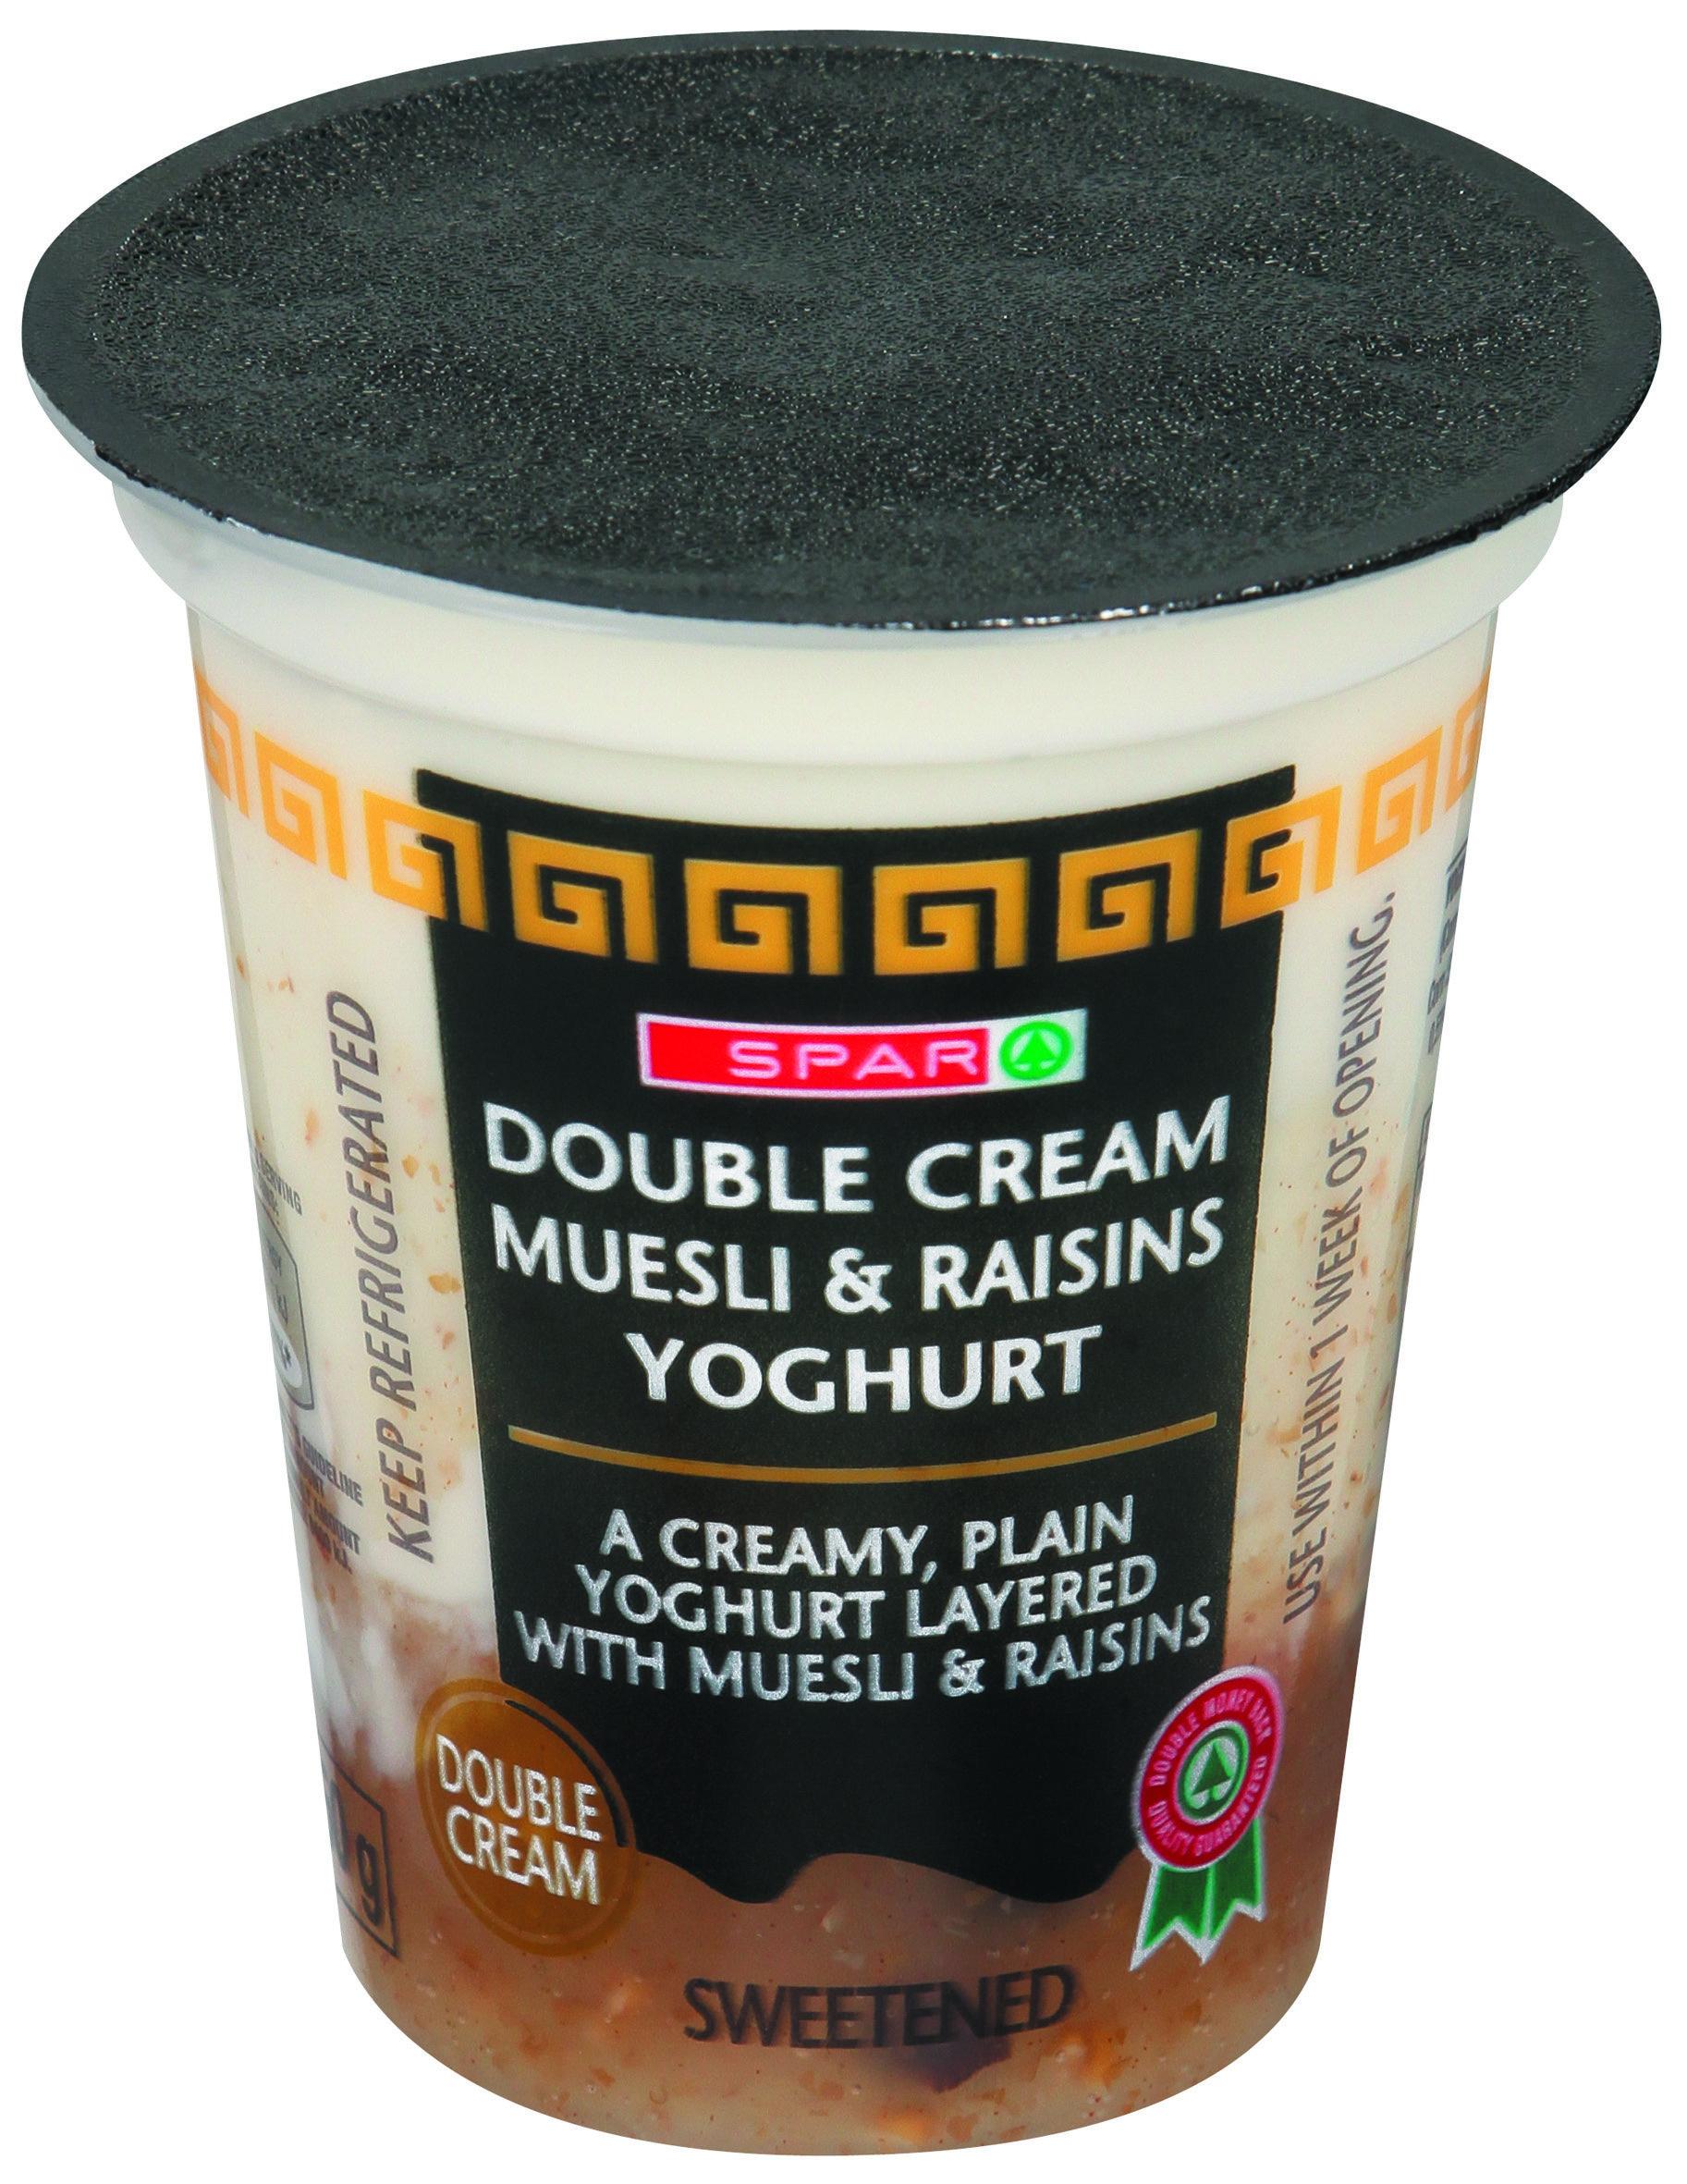 Muesil & Raisin Yoghurt